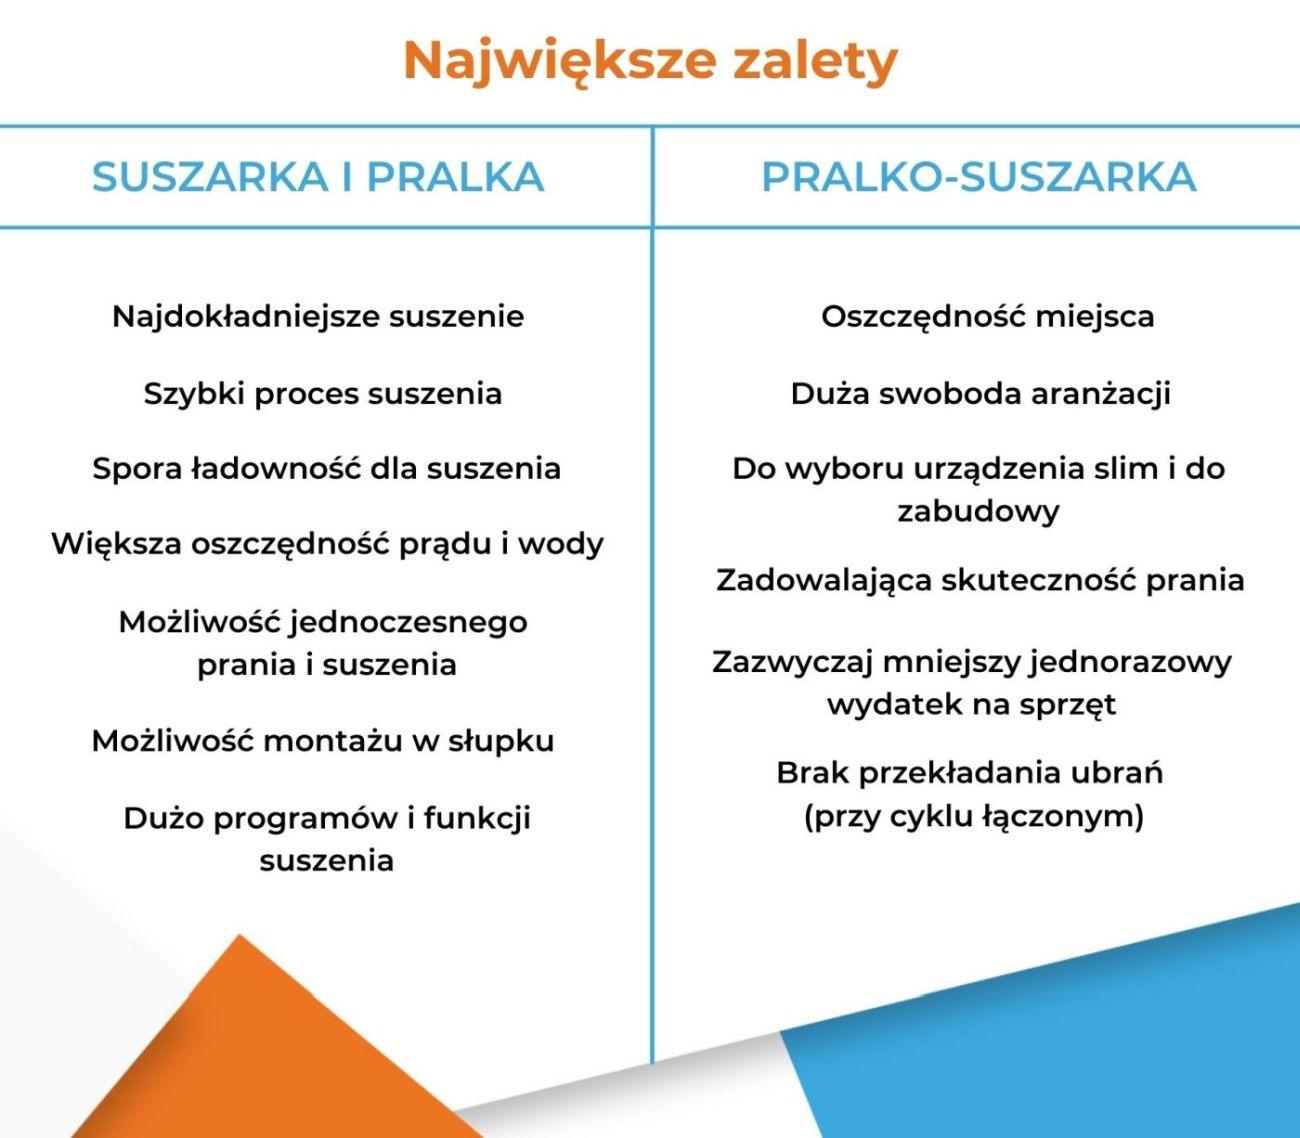 Suszarka i pralka czy pralko-suszarka - Zalety - Infografika